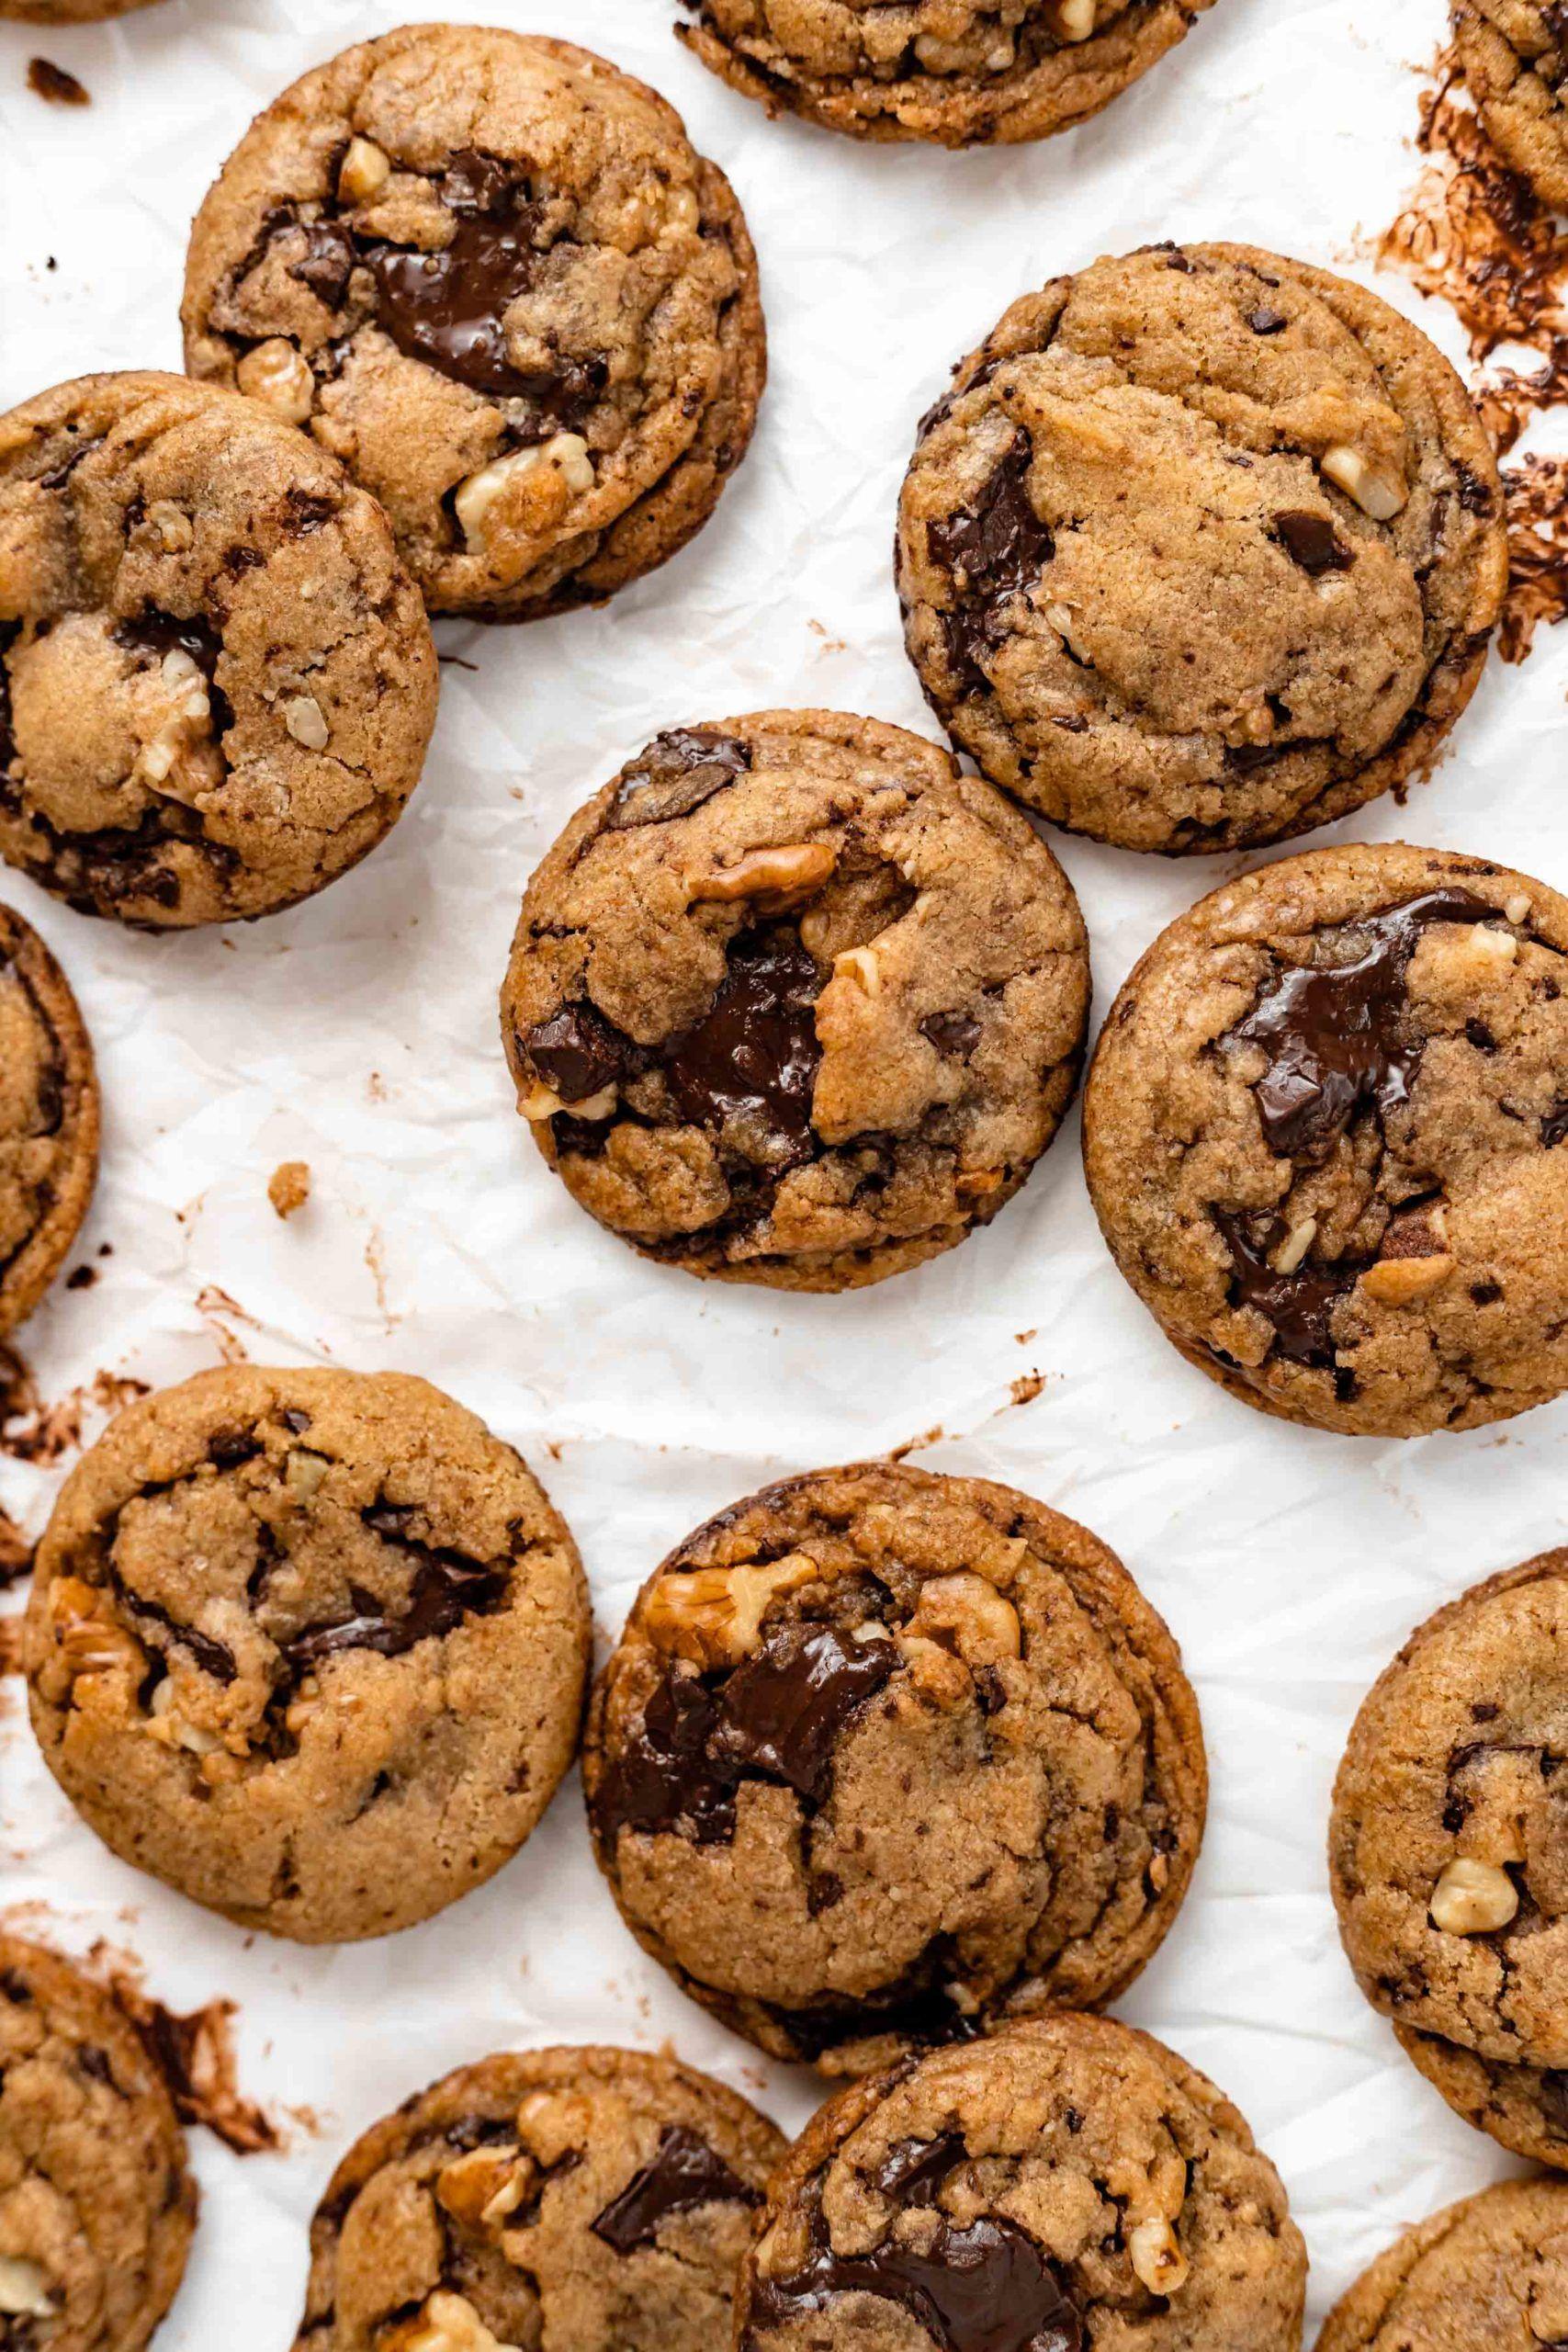 Vegan Chocolate Chip Cookies Baked Ambrosia Recipe In 2020 Vegan Chocolate Chip Cookie Recipe Cookie Recipes Cookies Recipes Chocolate Chip